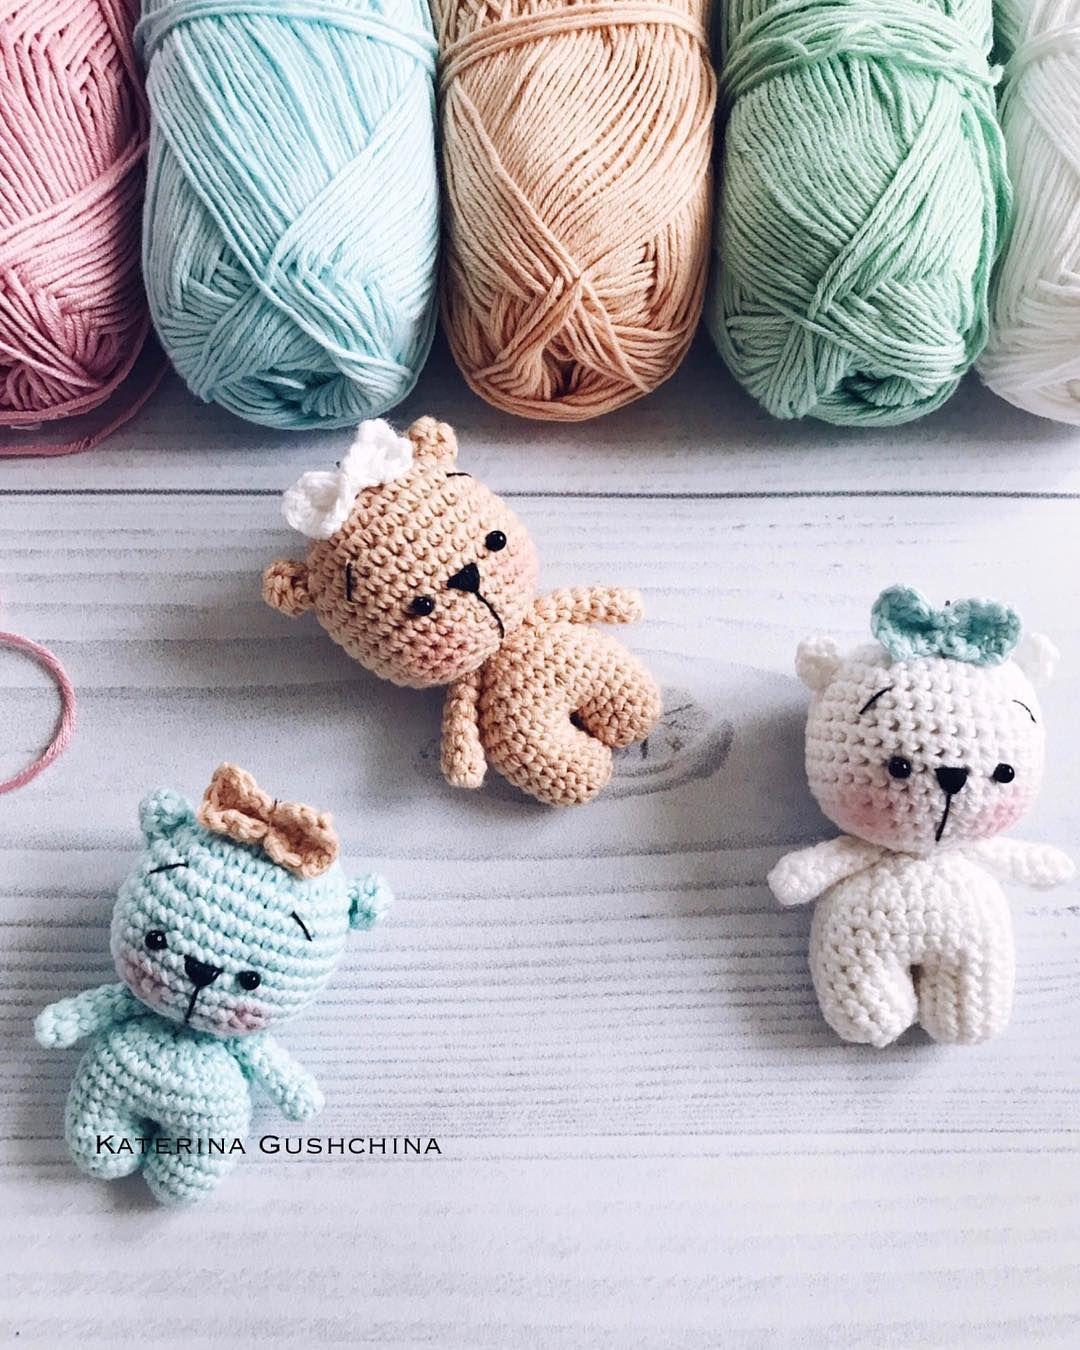 Tiny teddy bear crochet pattern | Amiguroom Toys